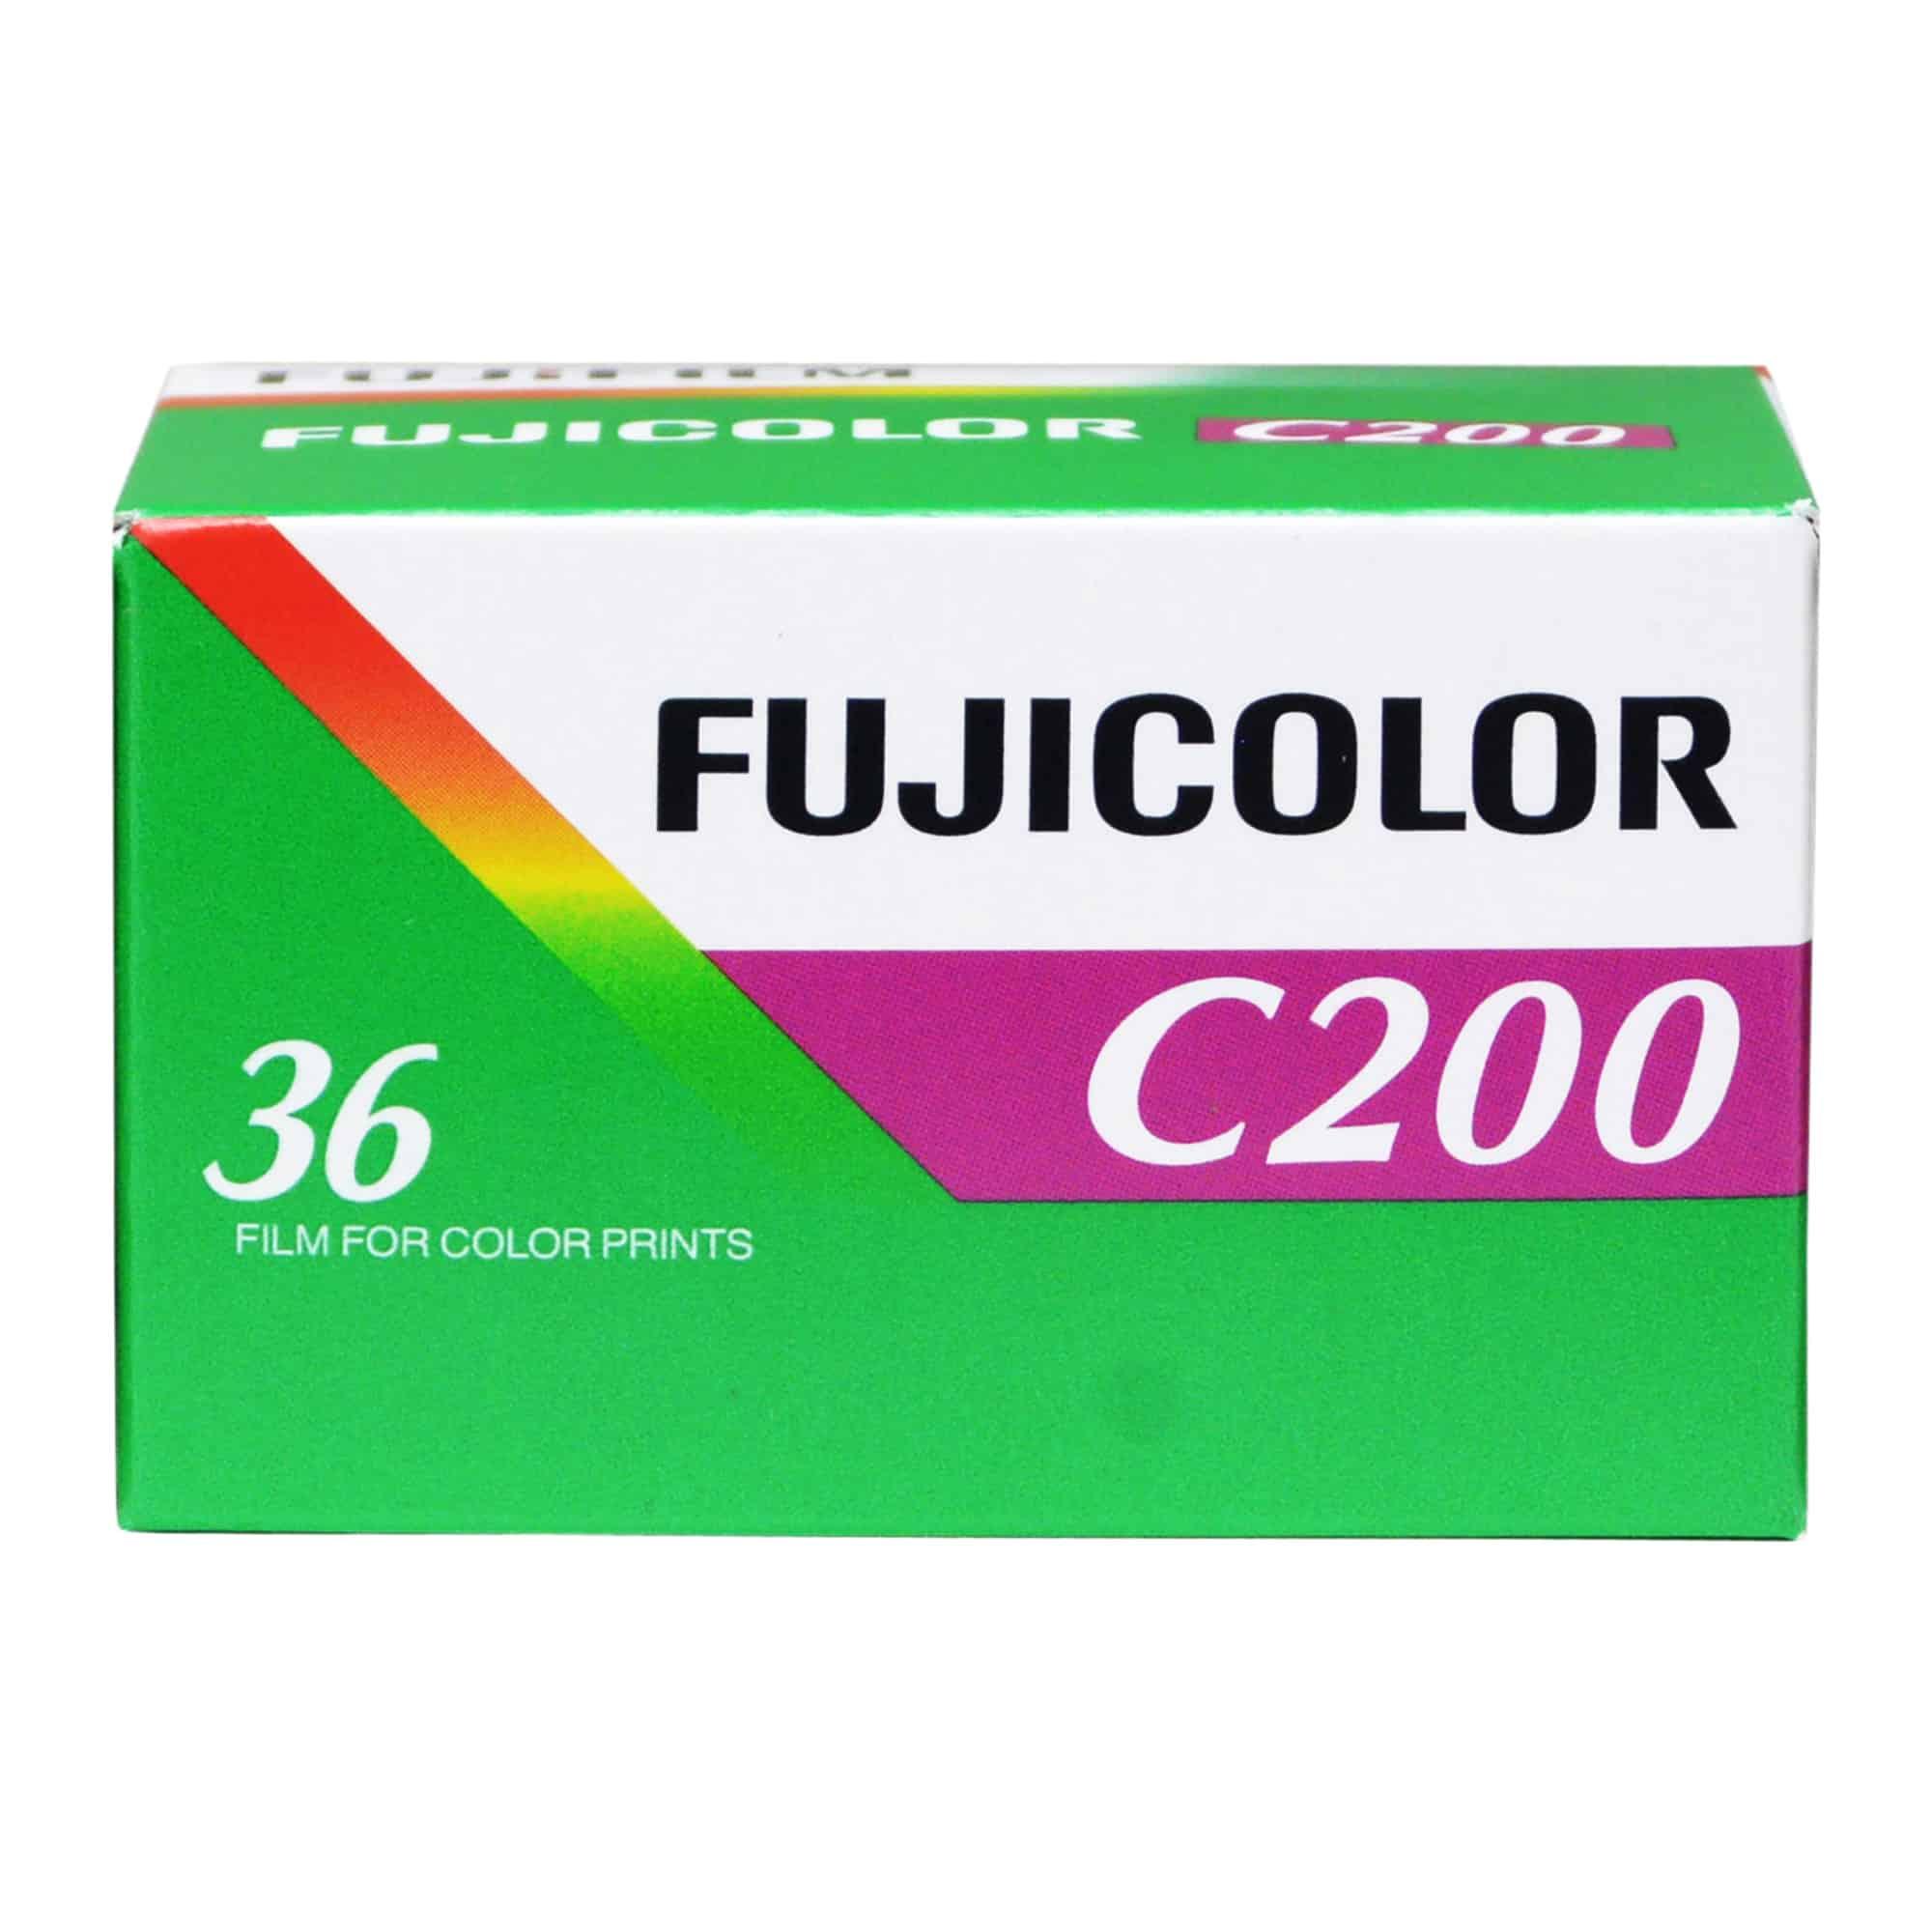 Fuji C 200 1 - 5 ฟิล์มสี ถูกและดี สำหรับมือใหม่หัดเล่นกล้องฟิล์ม